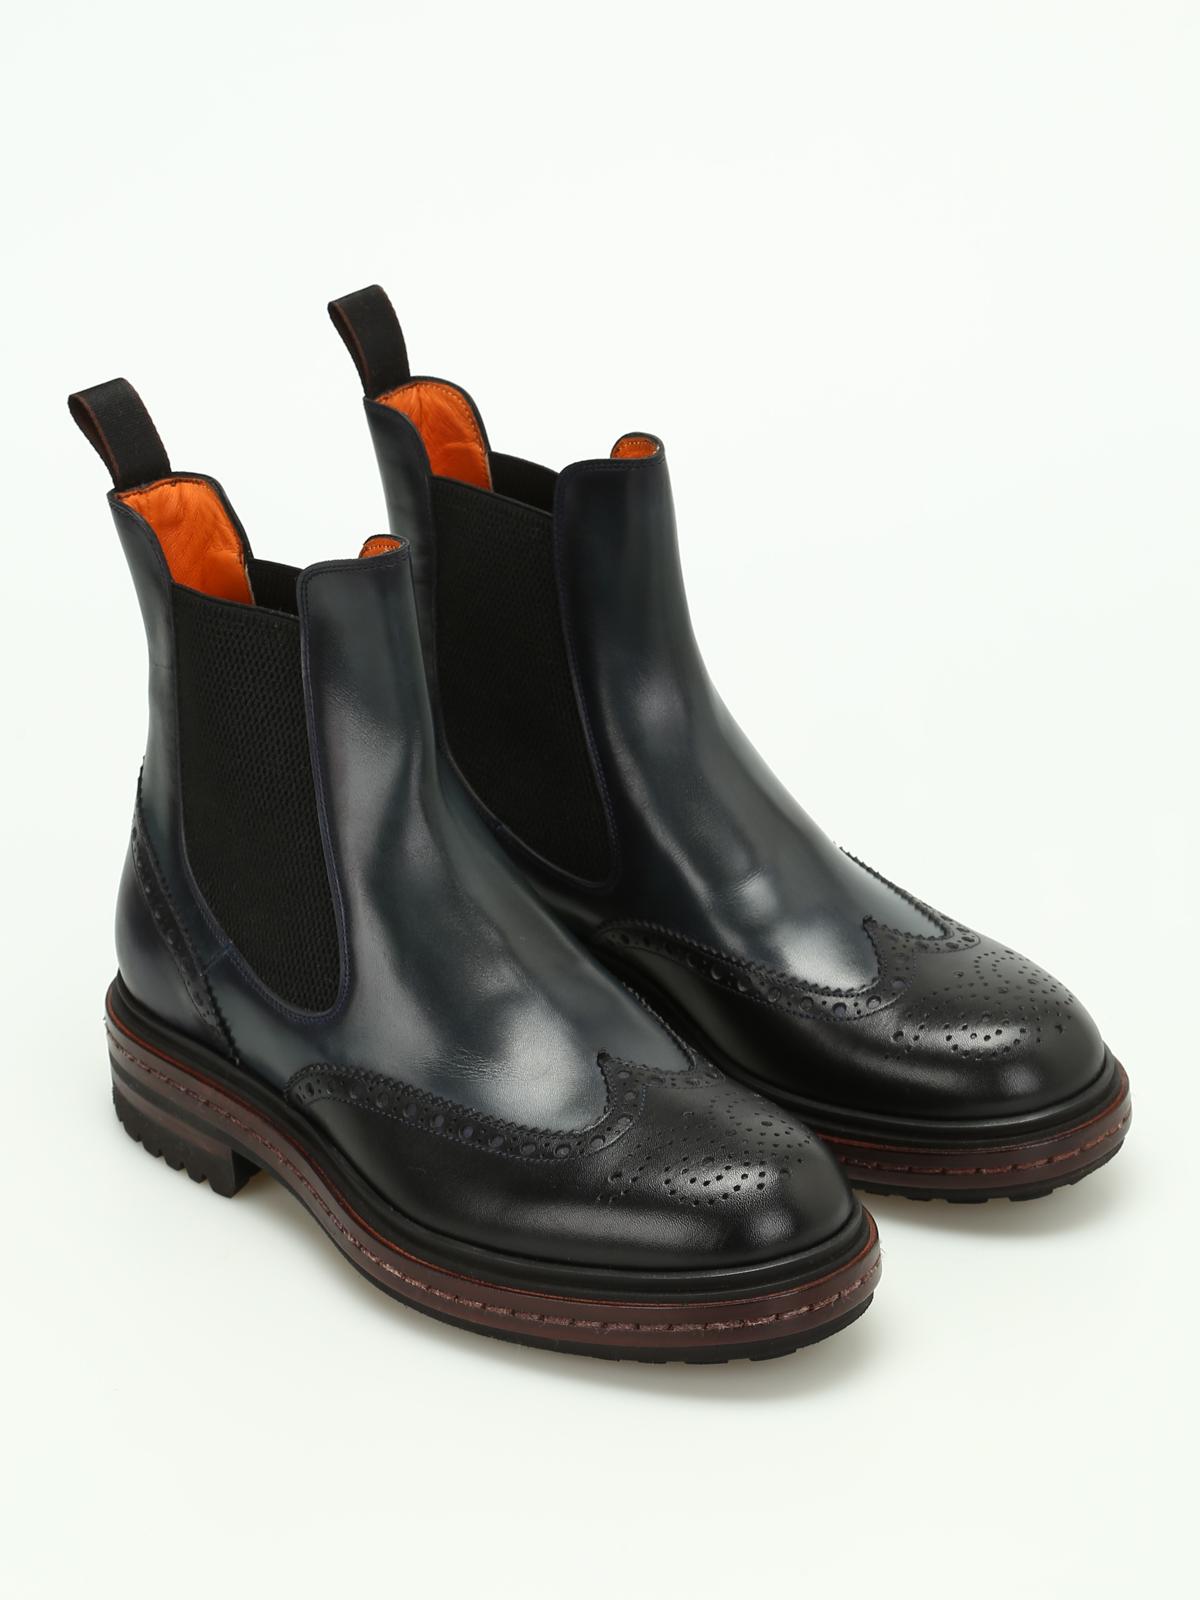 SANTONI Ankle boots buy cheap choice 3kOfXO